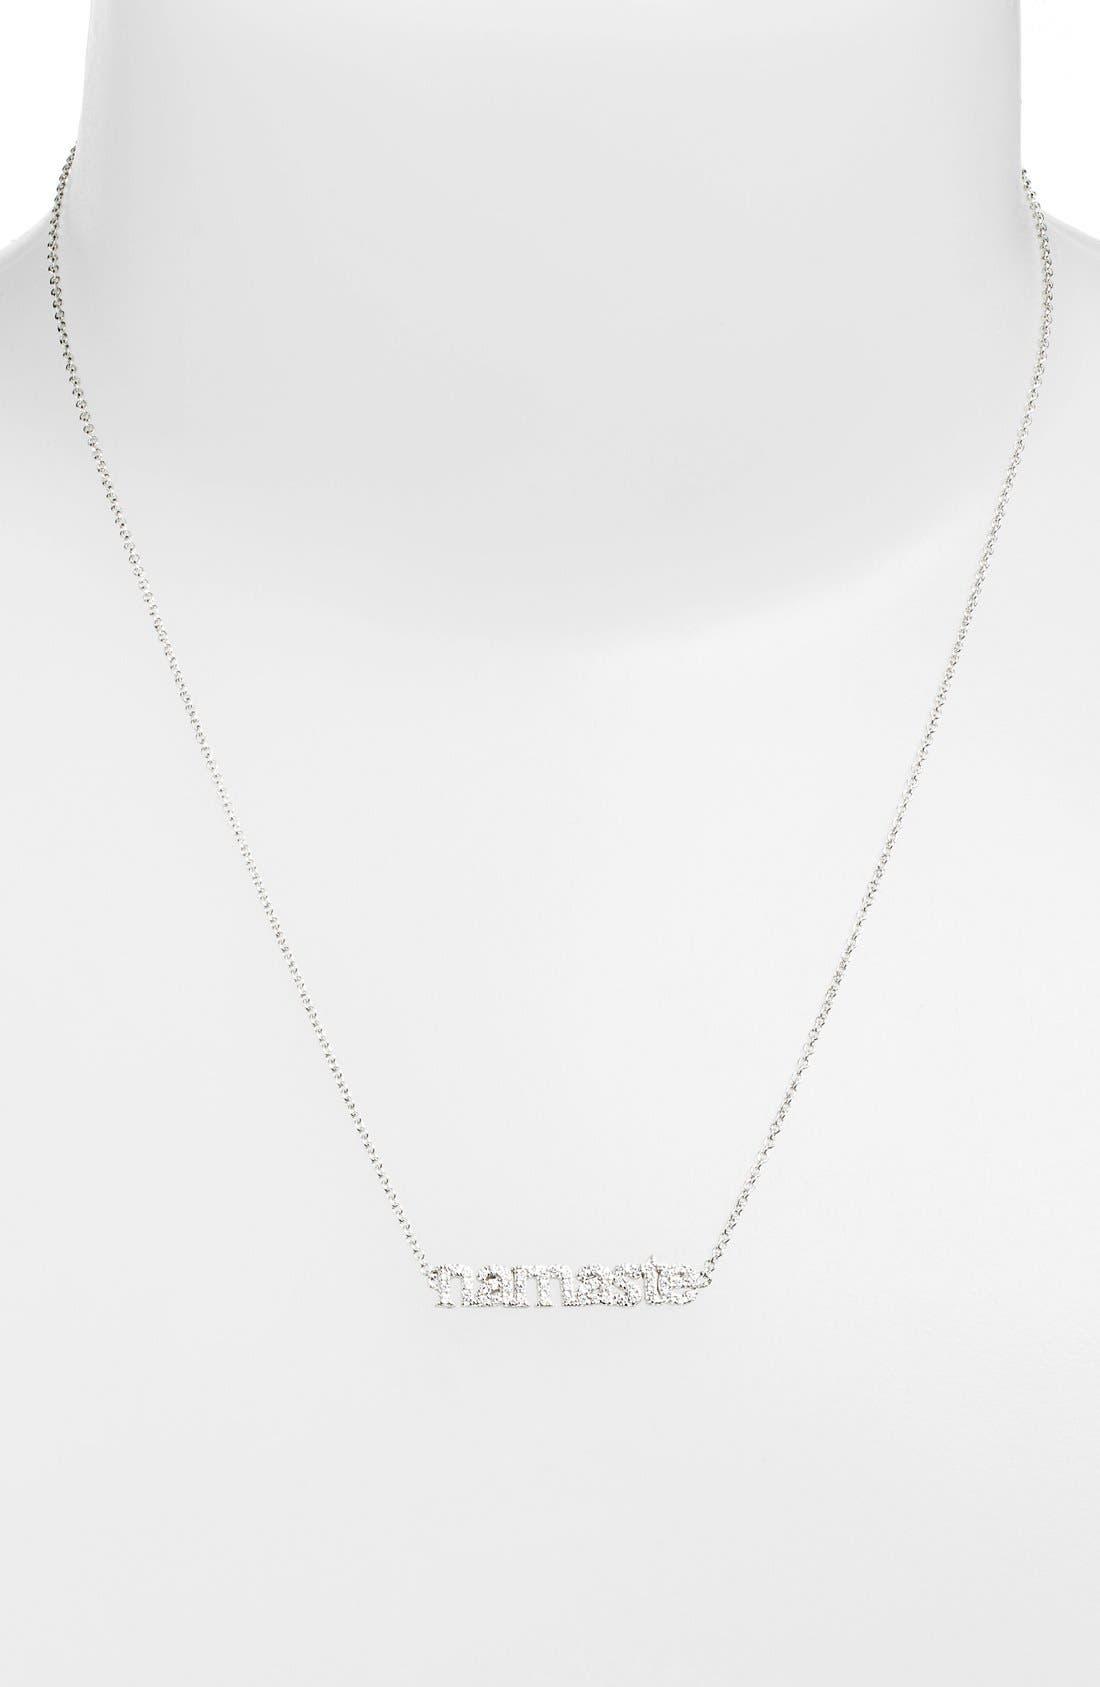 Alternate Image 1 Selected - Sugar Bean Jewelry 'Namaste' Pendant Necklace